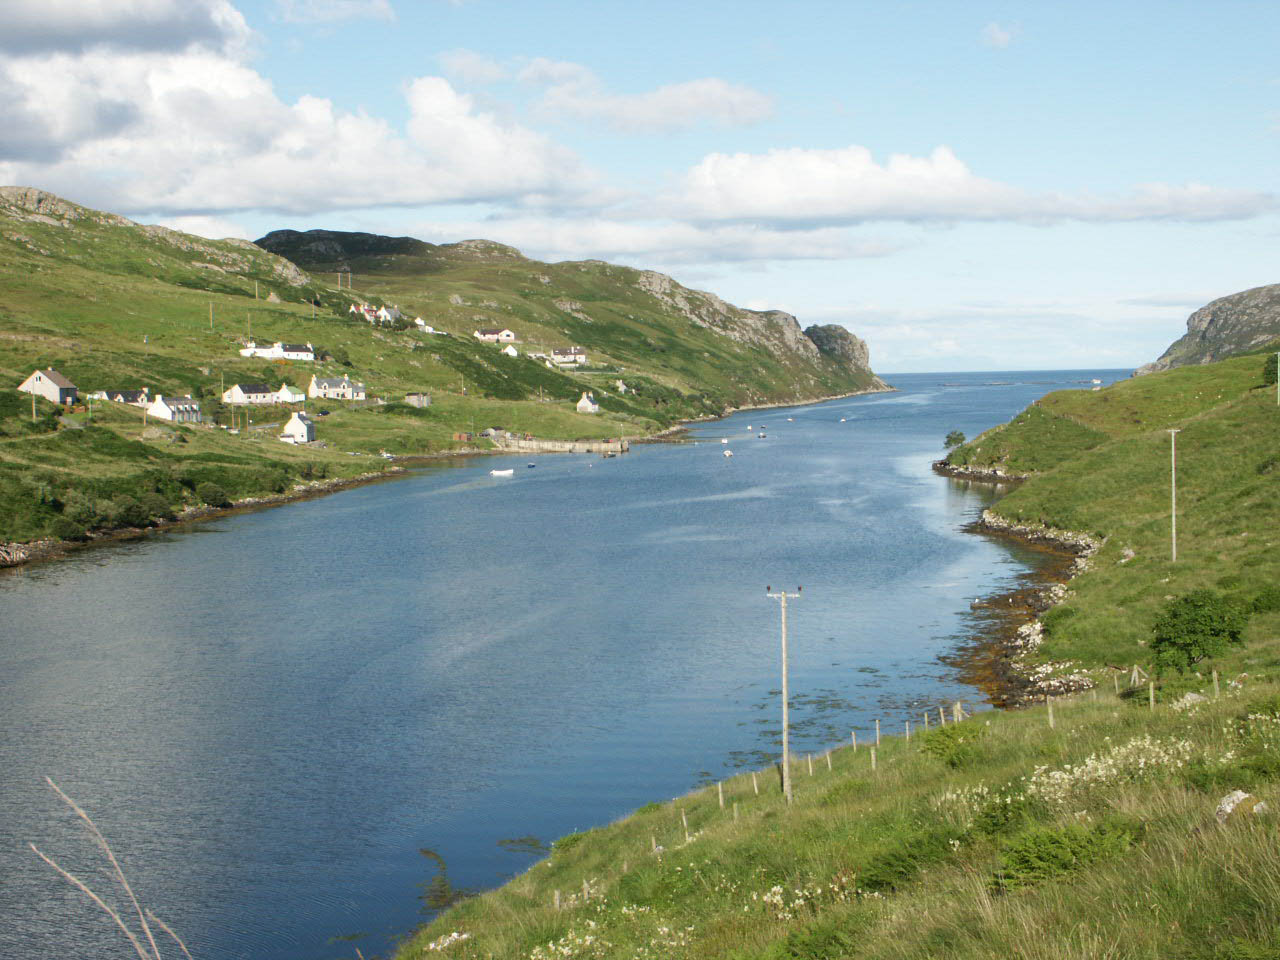 Loch Odhairn, Gravir